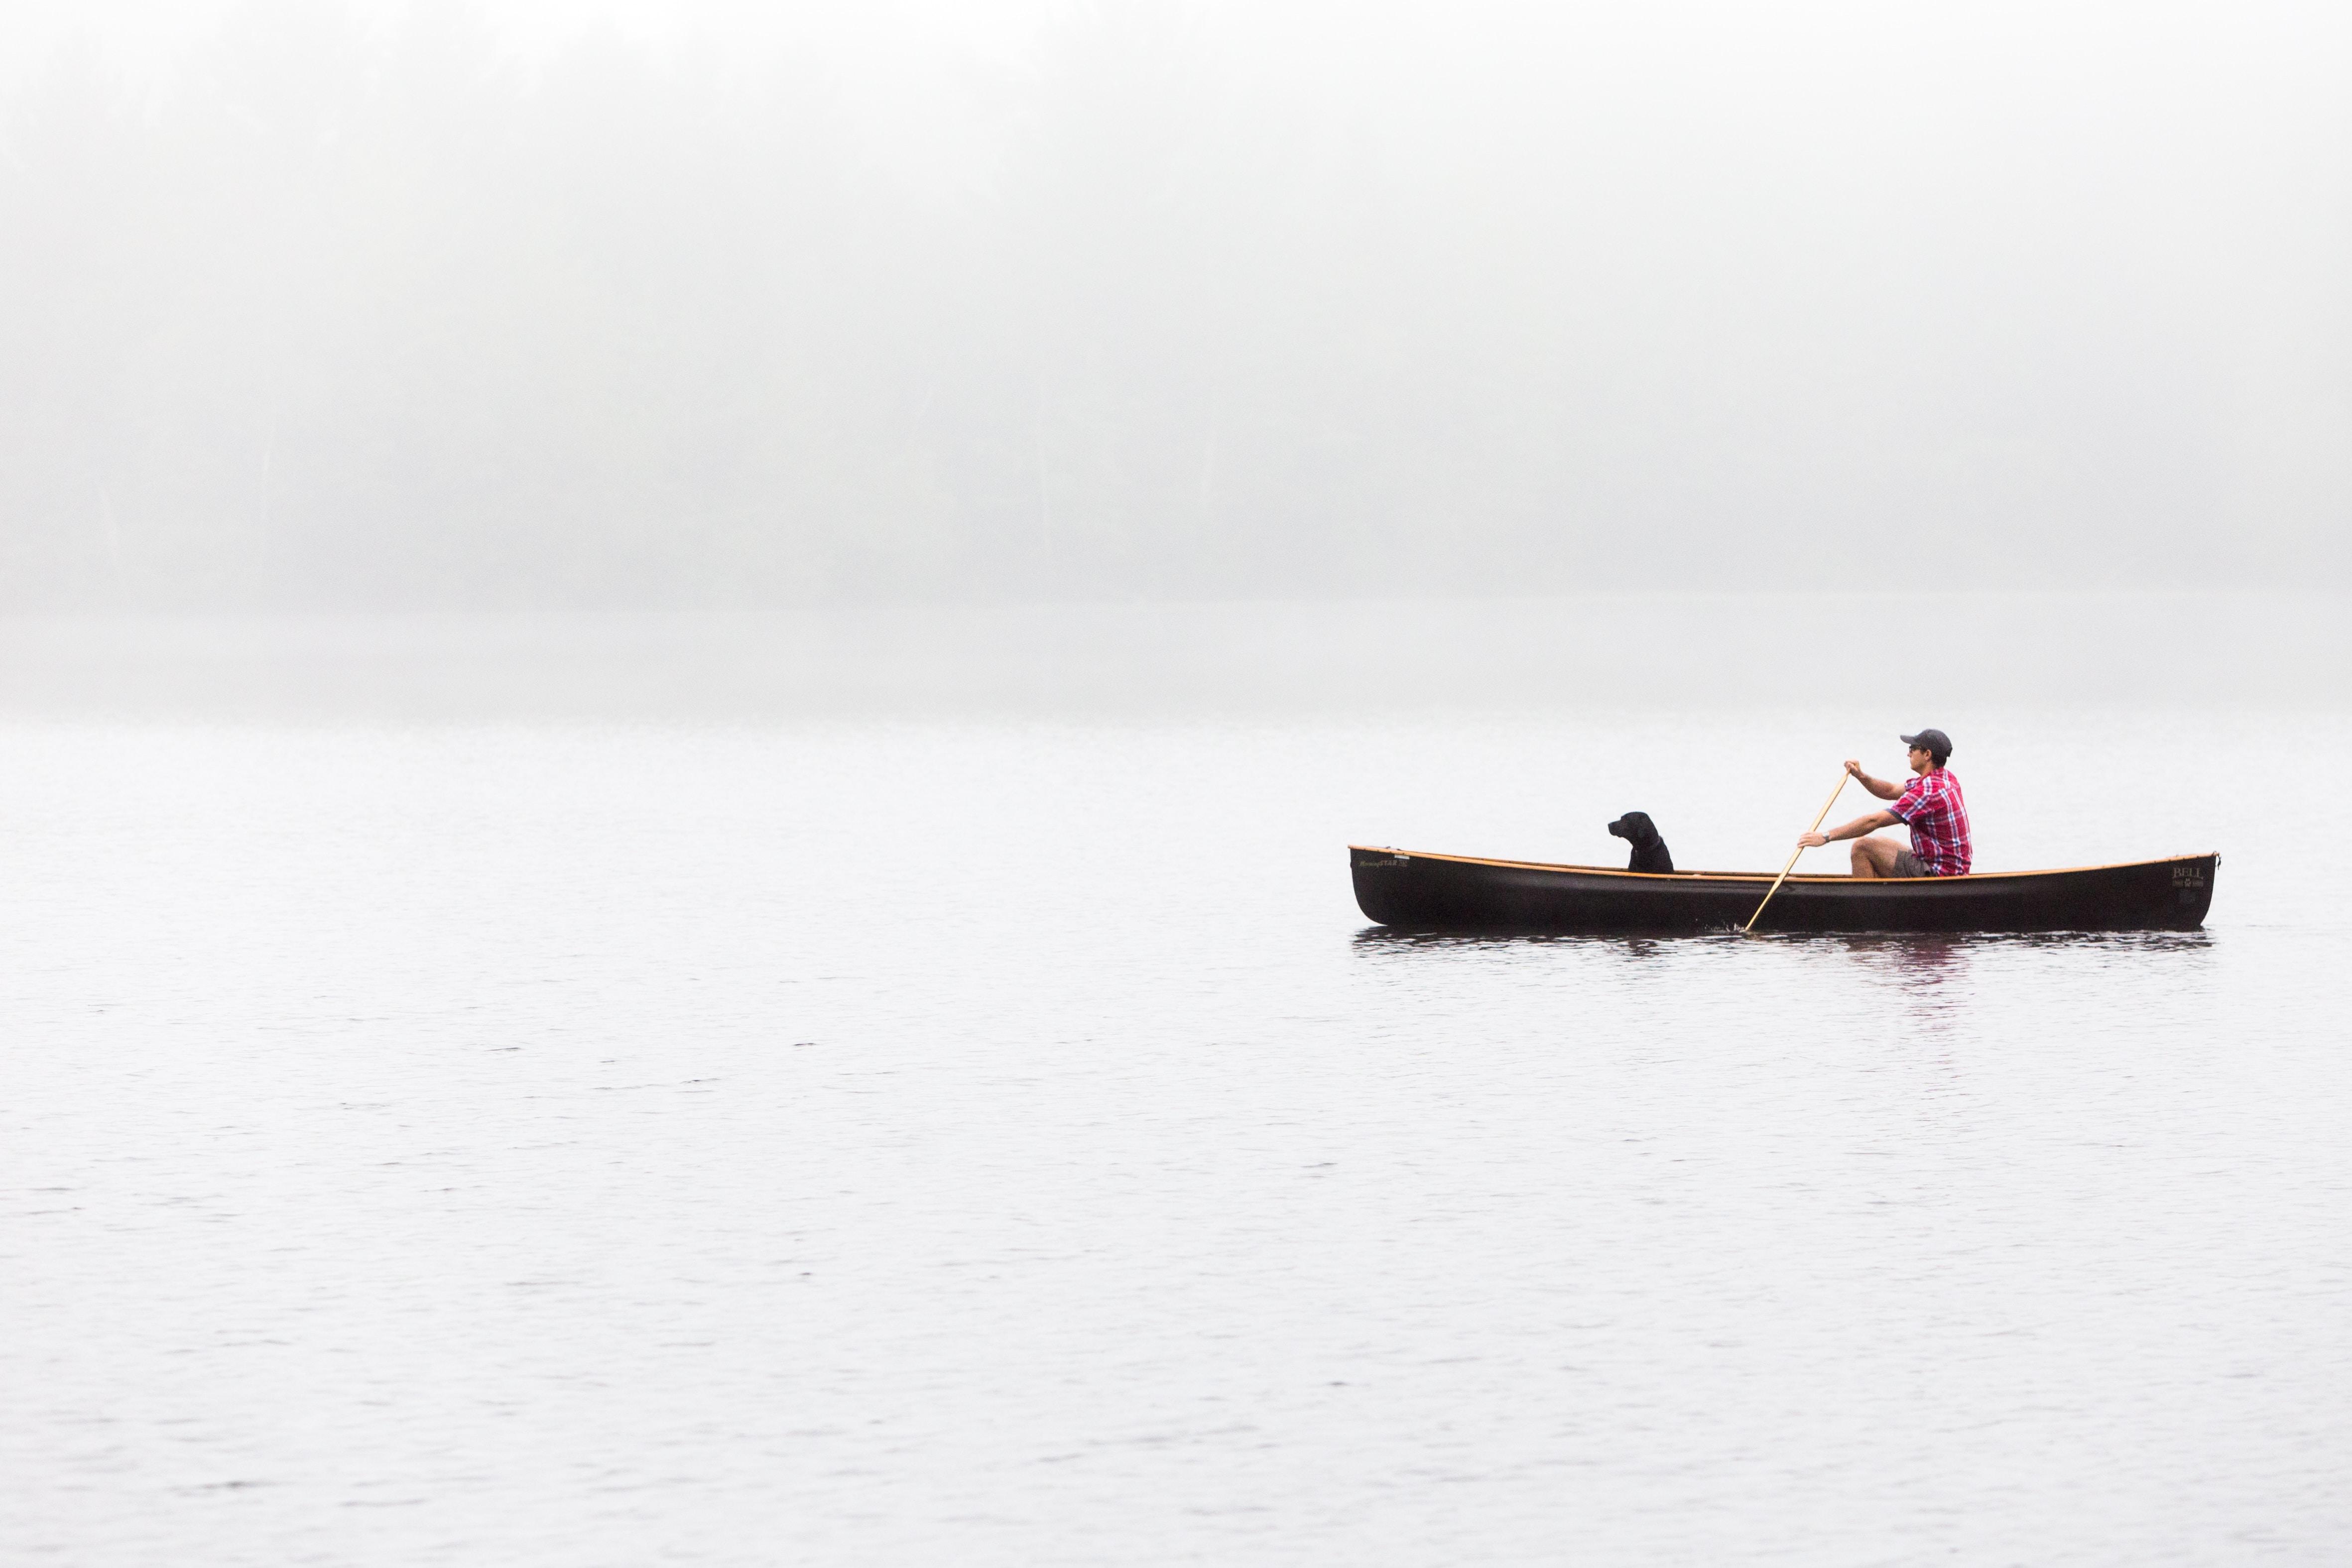 Man and dog on a foggy morning canoe ride through a calm lake